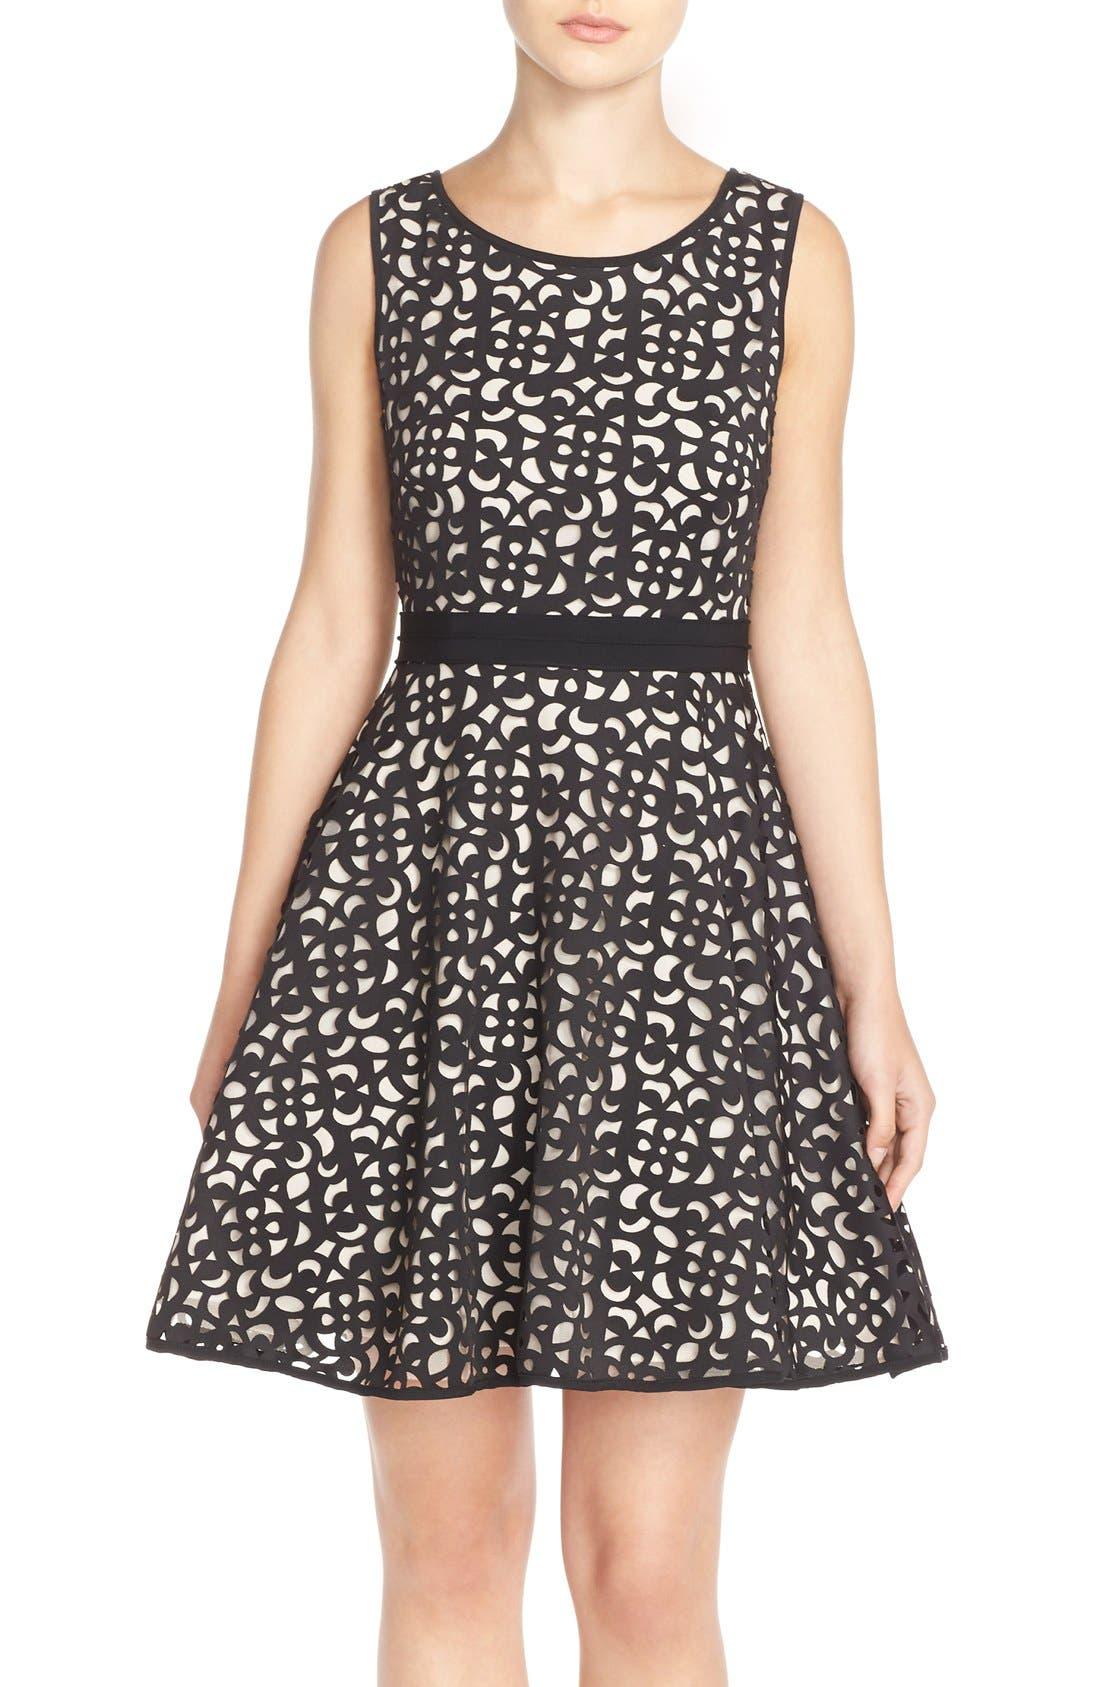 Alternate Image 1 Selected - XscapeLaser Cut Scuba Fit & Flare Dress